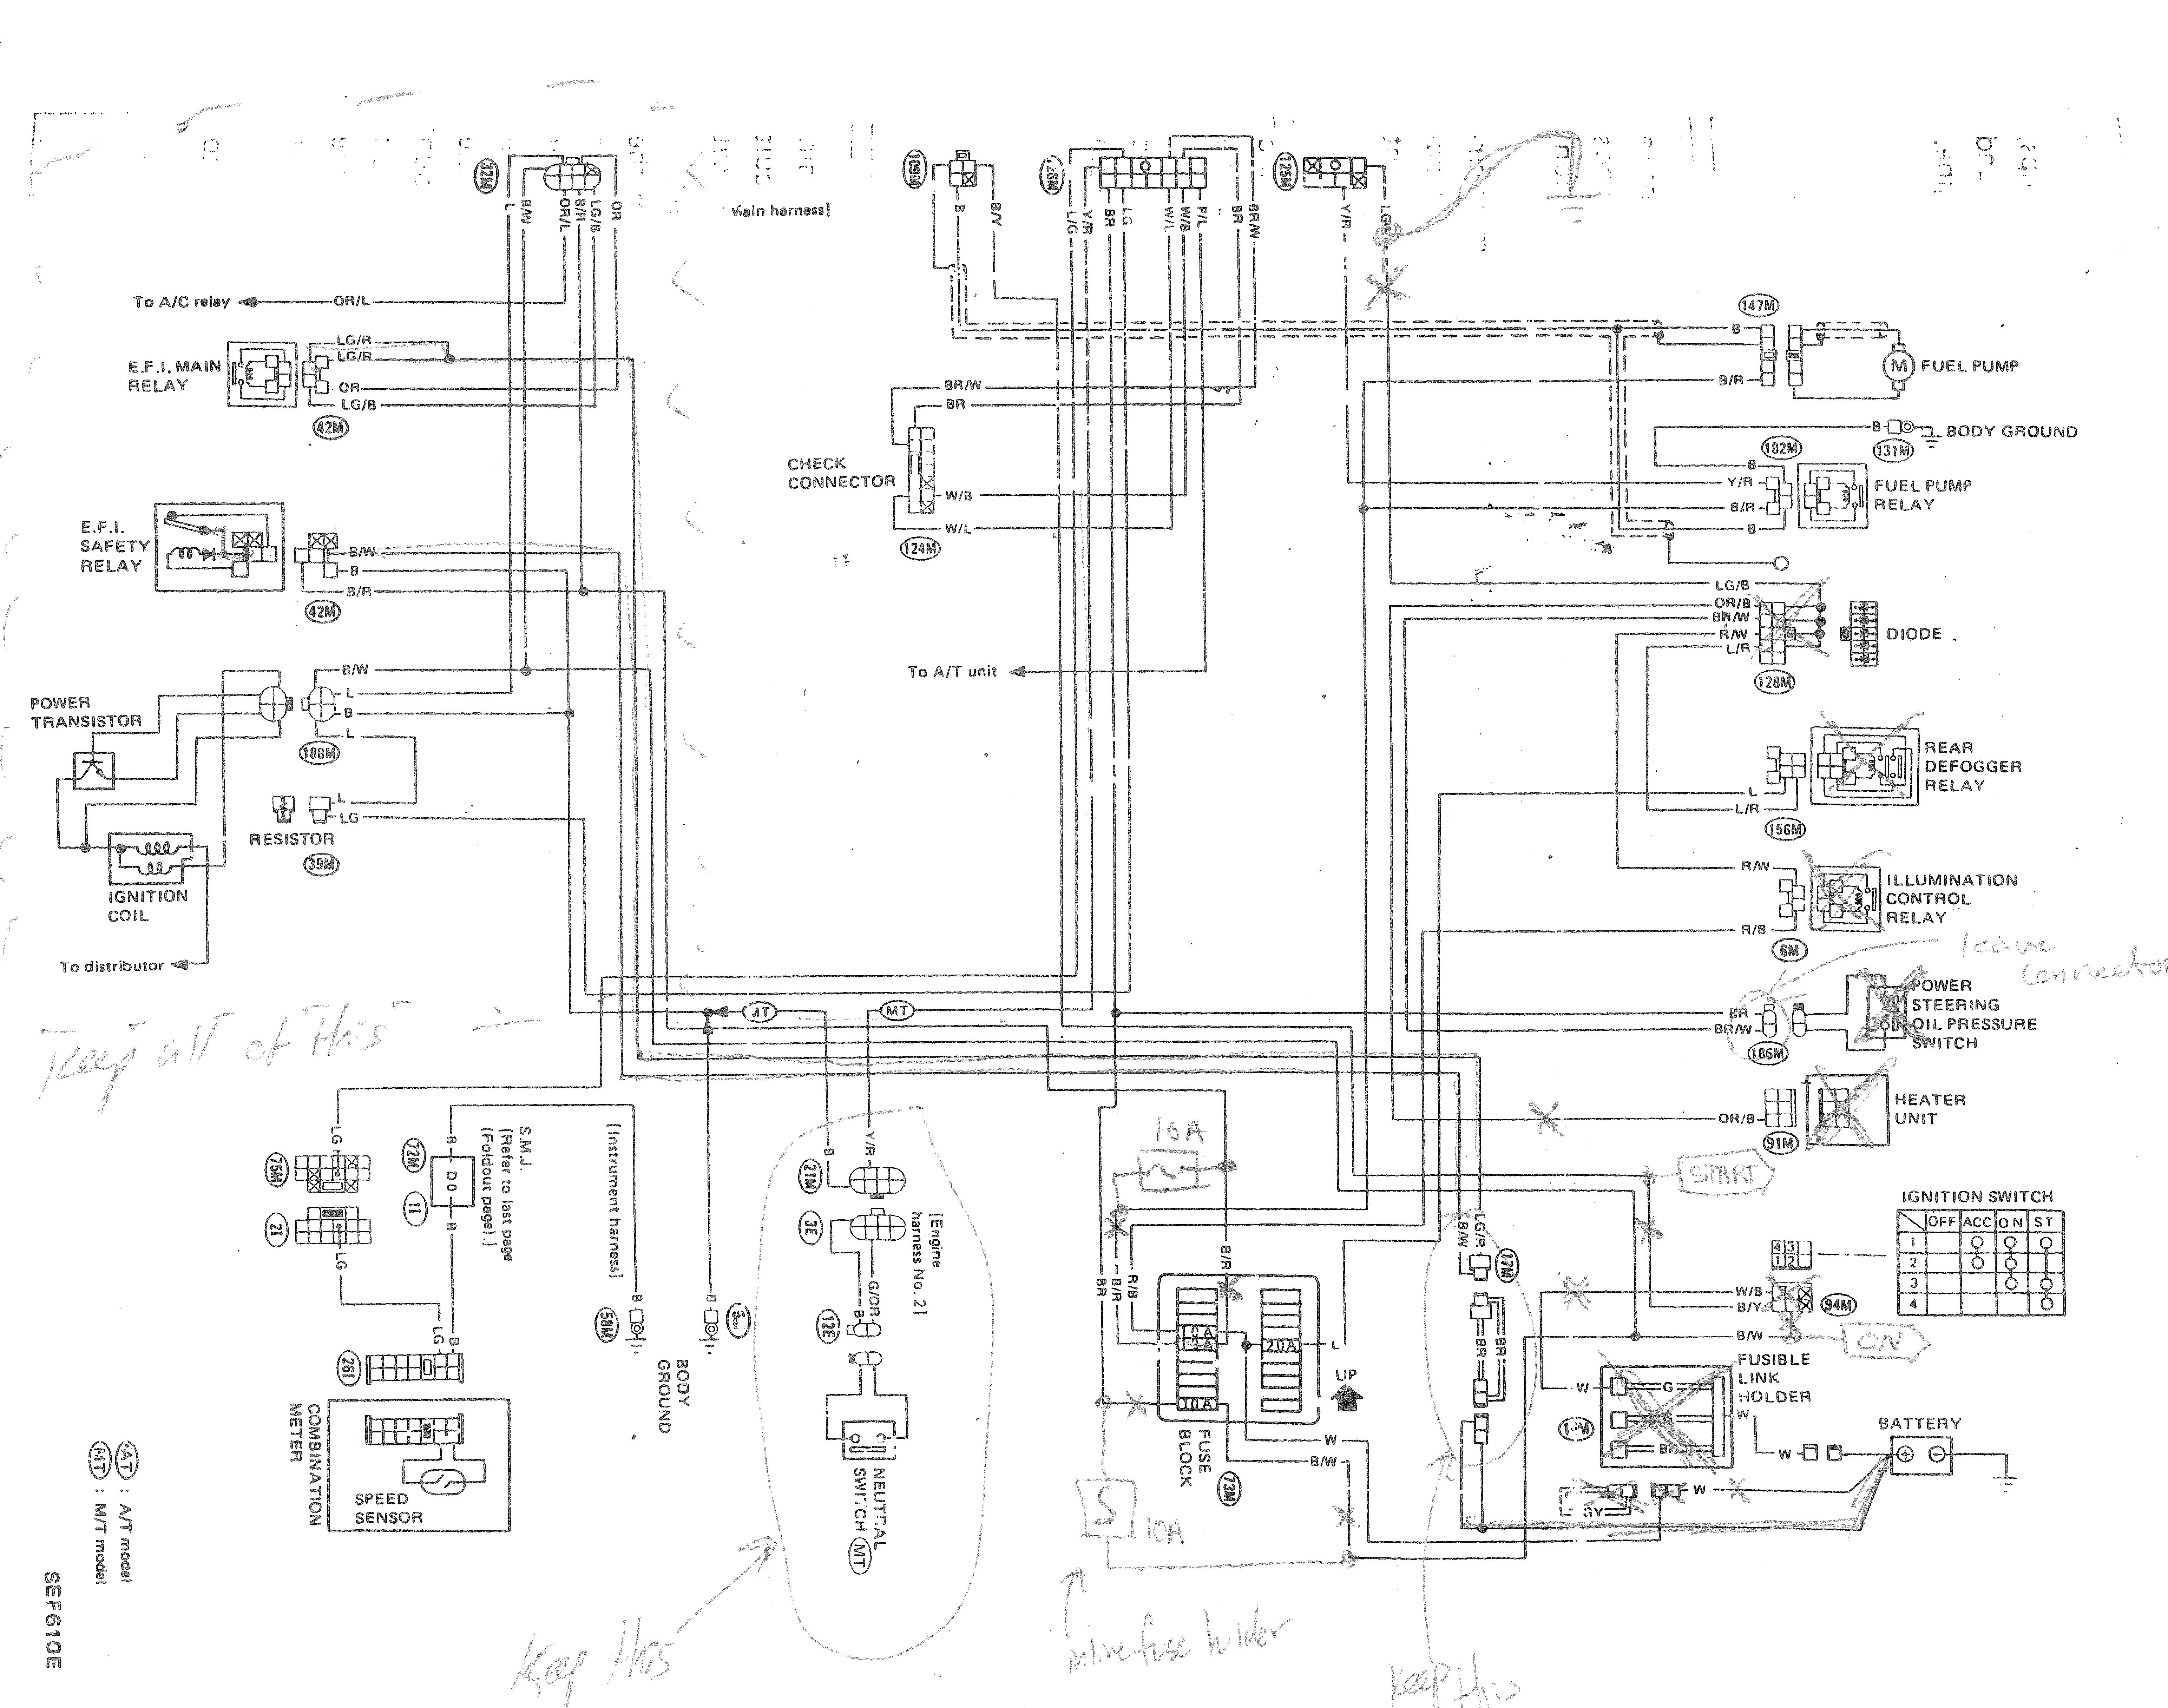 Nissan Vg30 Wiring Diagram 10 In